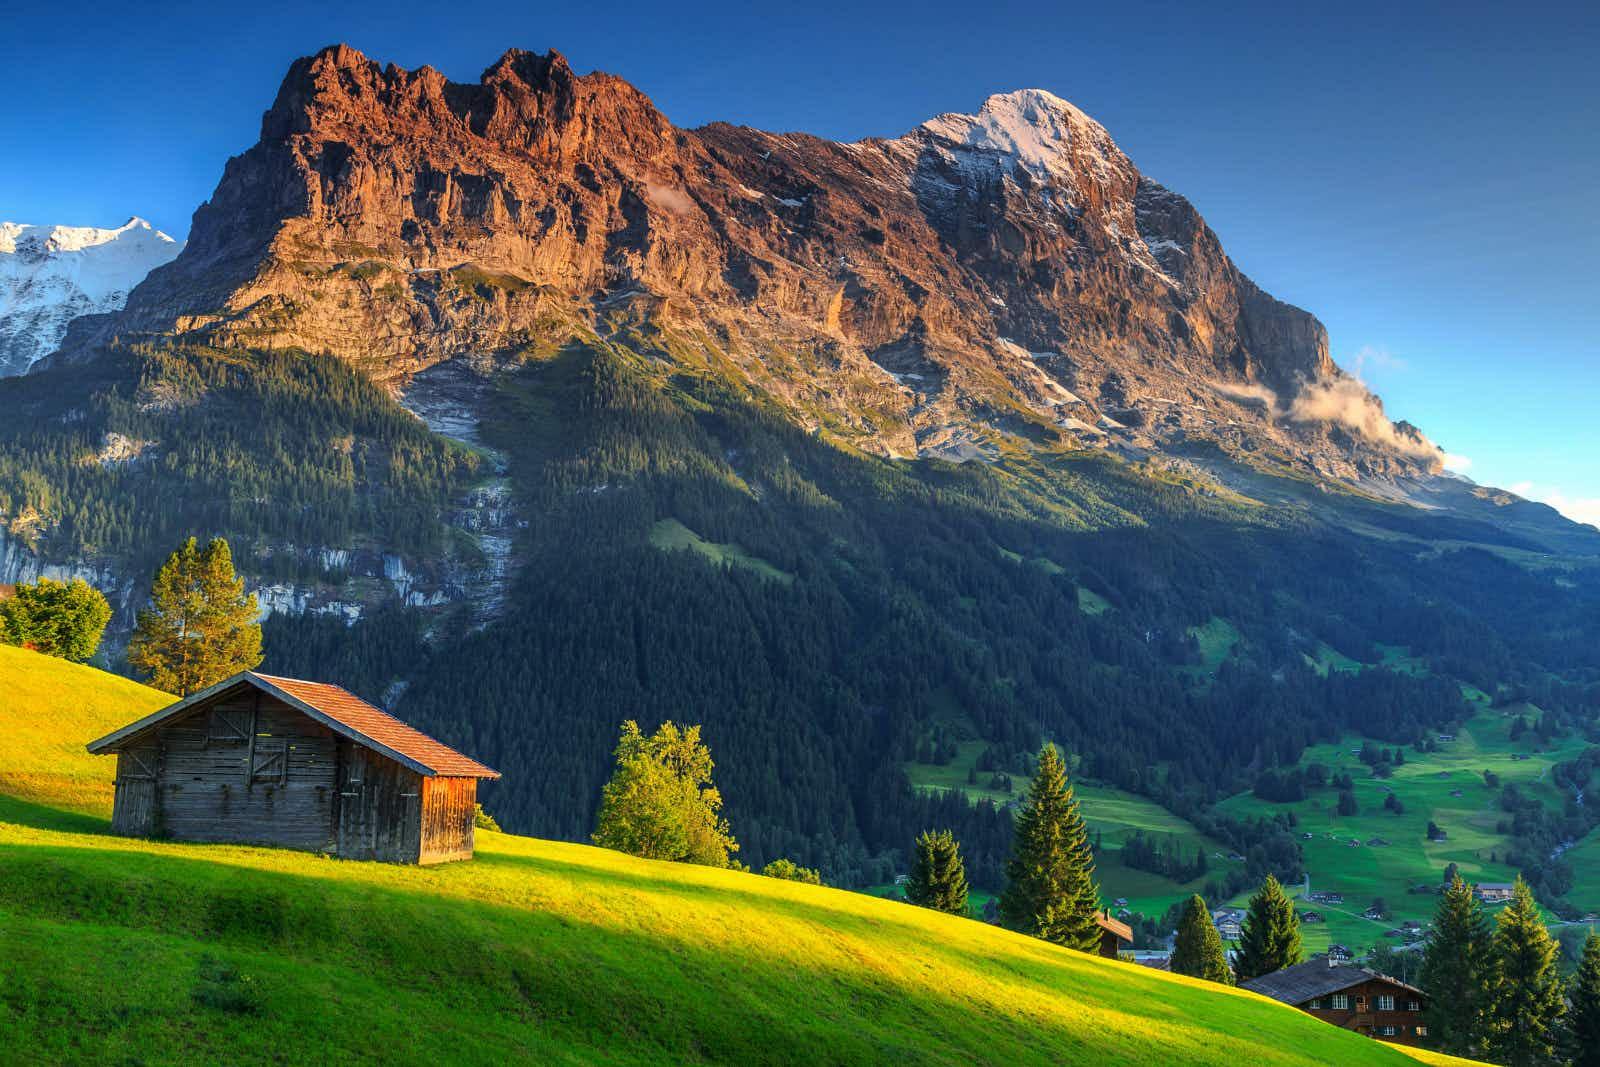 A mountain hut under the shadow of the Eiger mountain in Switzerland © Gaspar Janos / Shutterstock